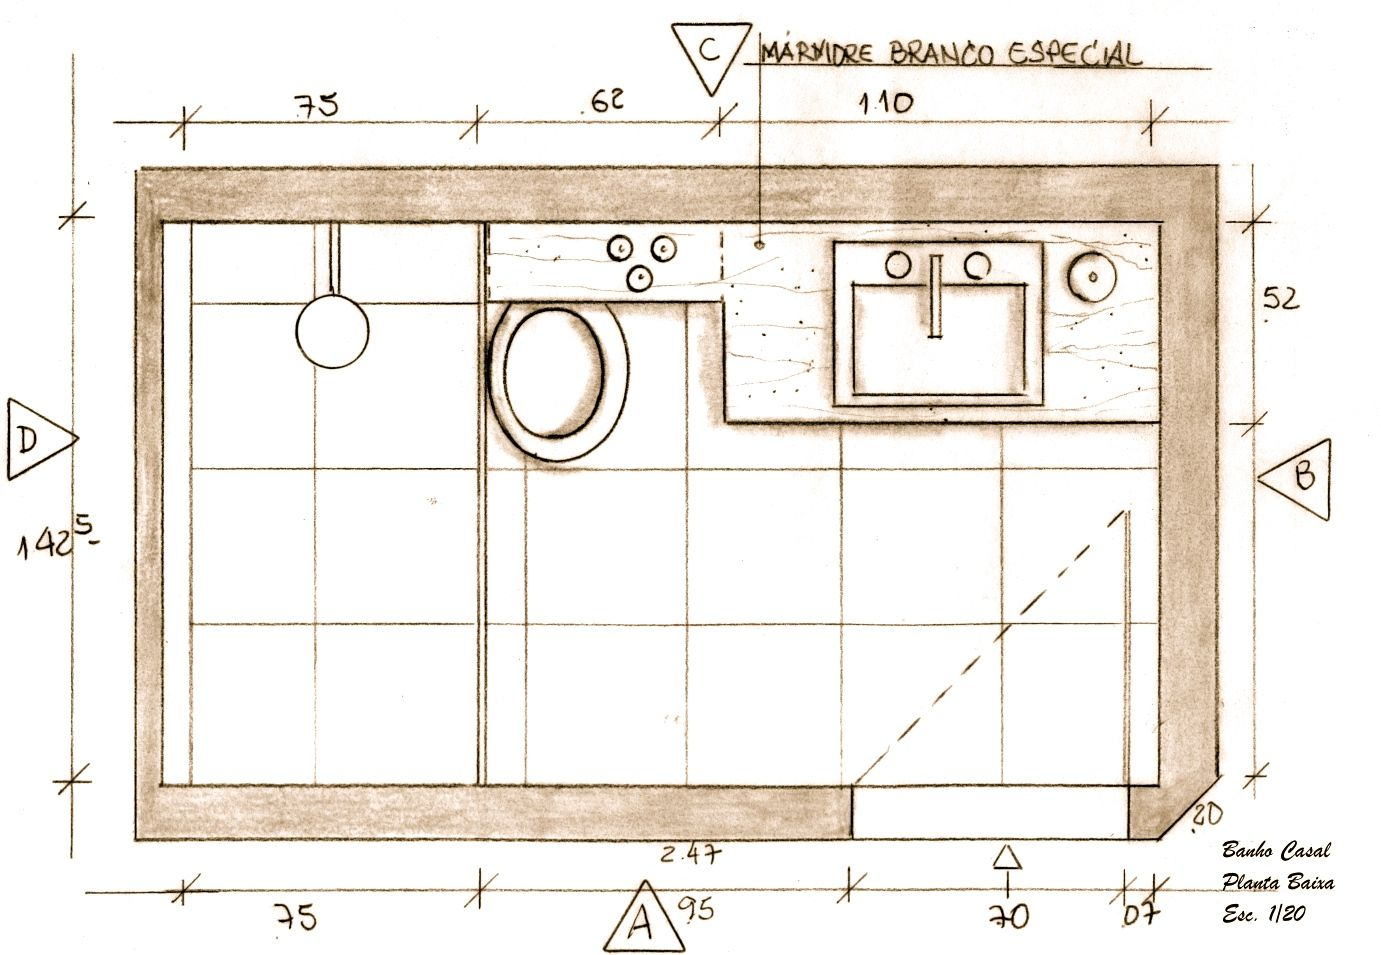 Medidas Banheiro Planta Baixa : Su?te casal banheiro planta baixa projeto ana lucia